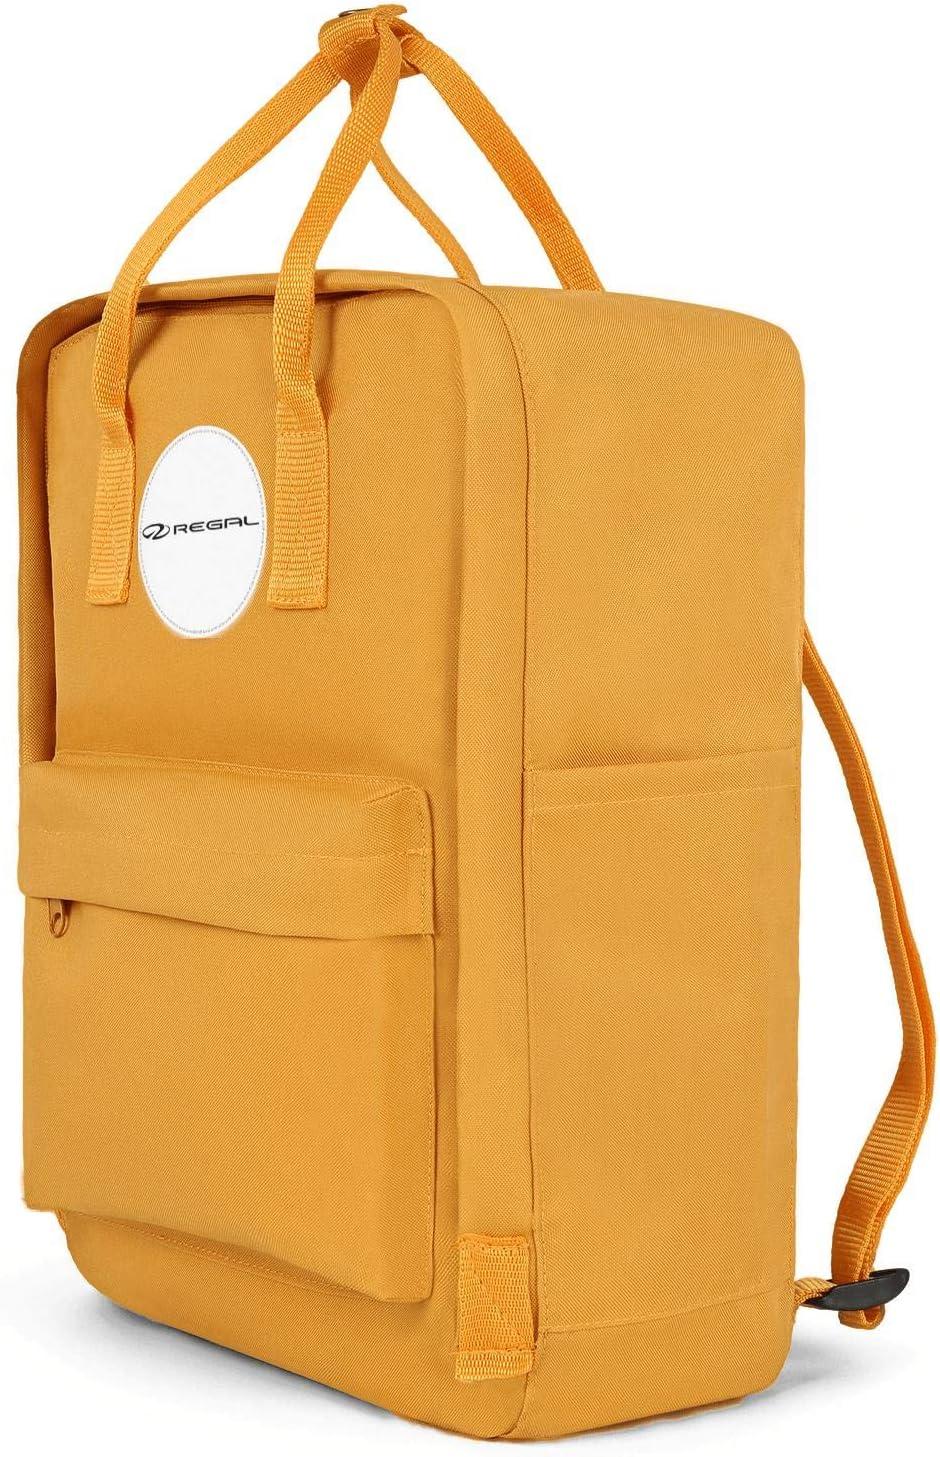 Bookbags Womens Oxford School Bag Fashion Mens Waterproof Backpacks Regal-yacht-logo-boat